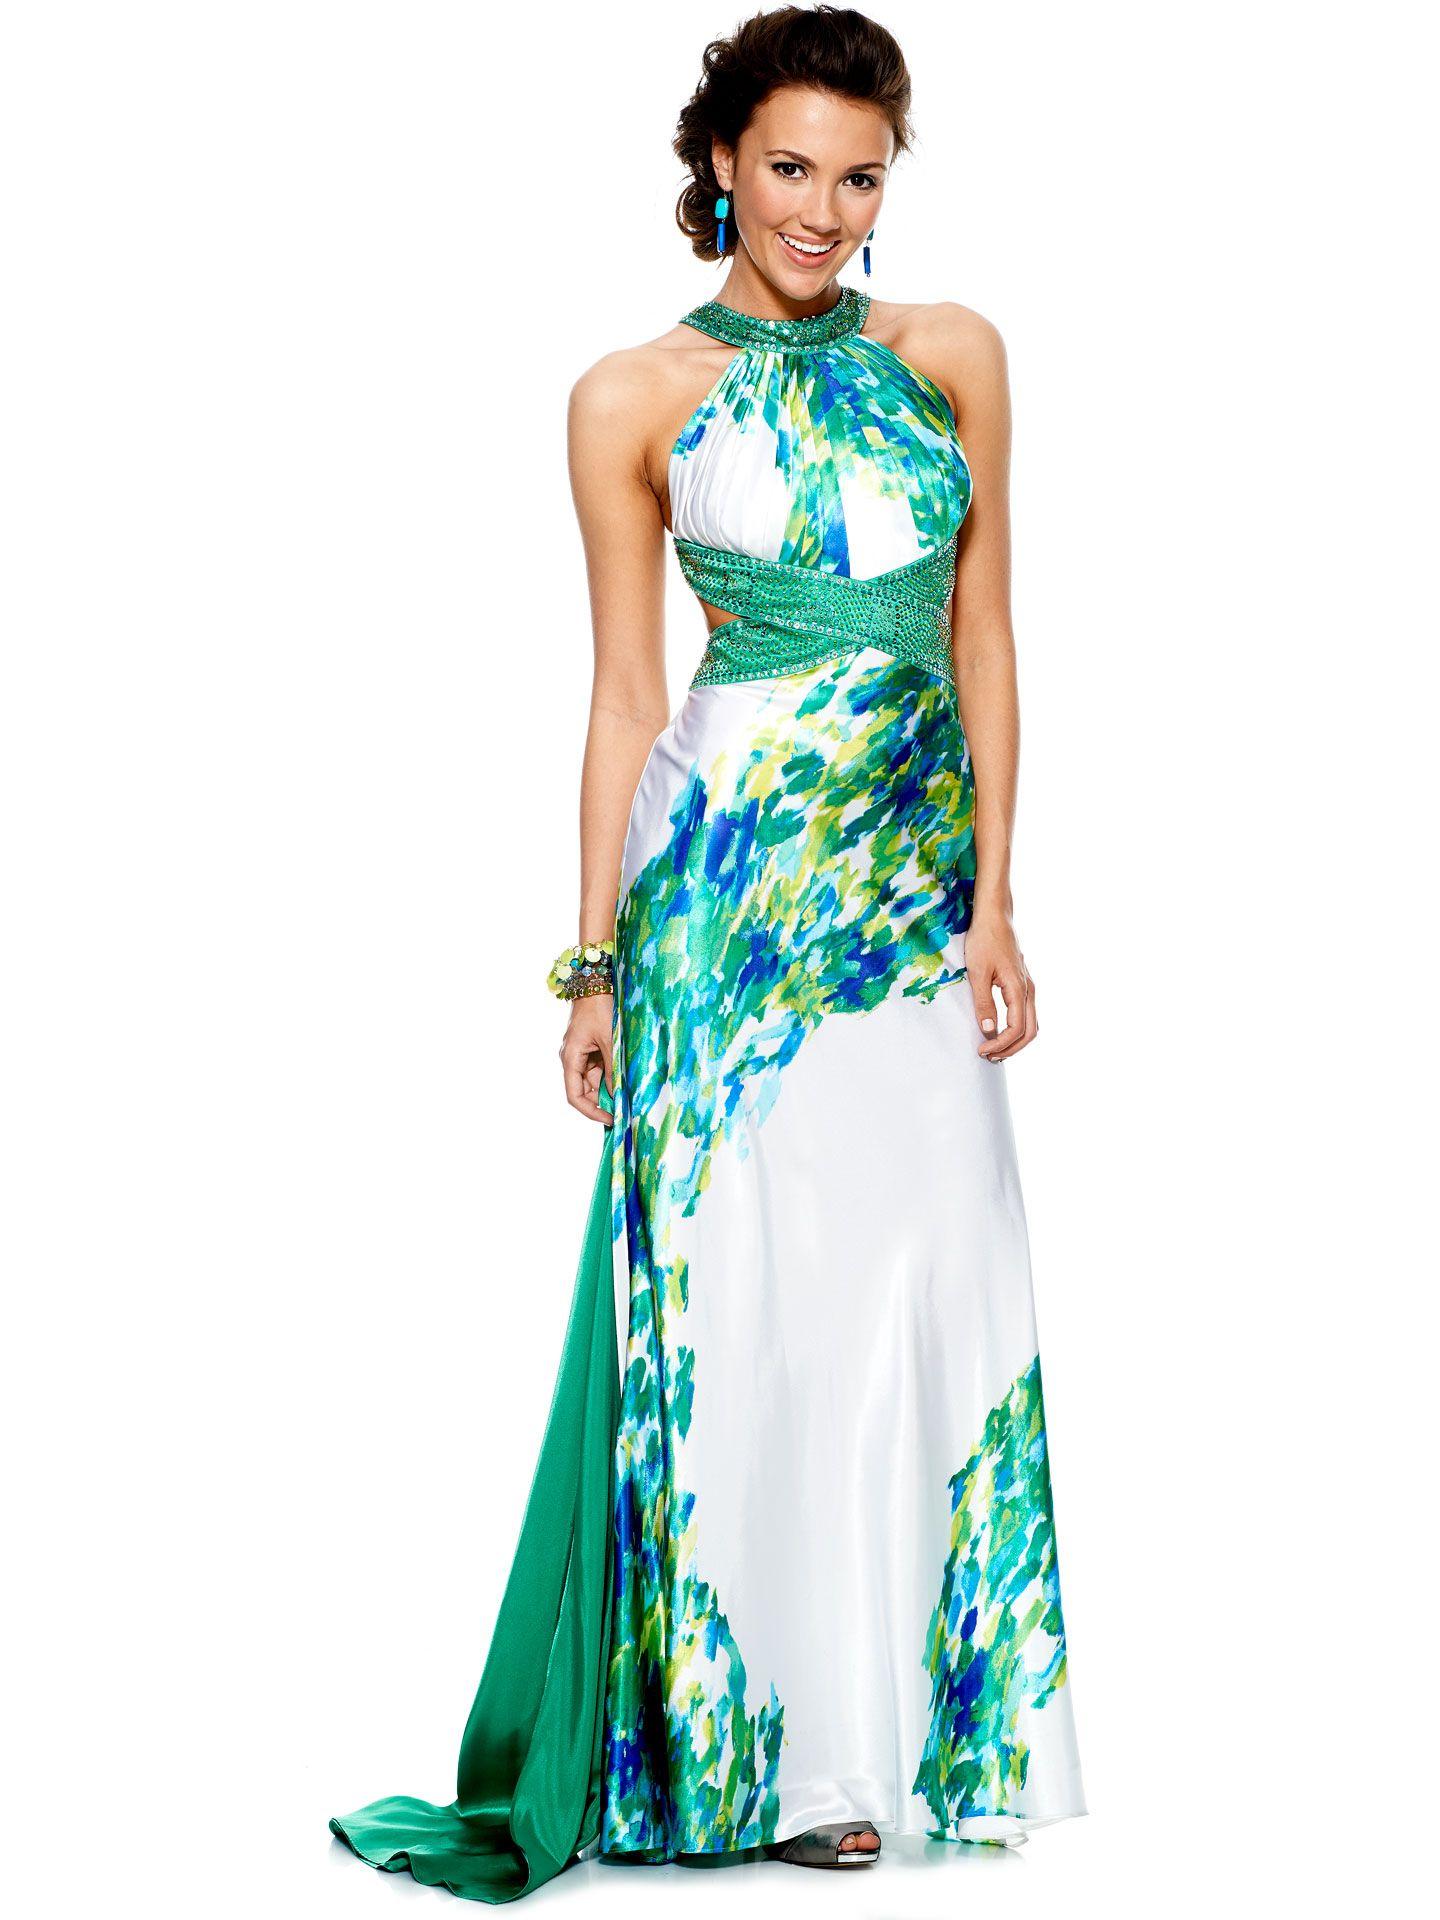 Camo Prom Dresses - Colorful Prom Dresses